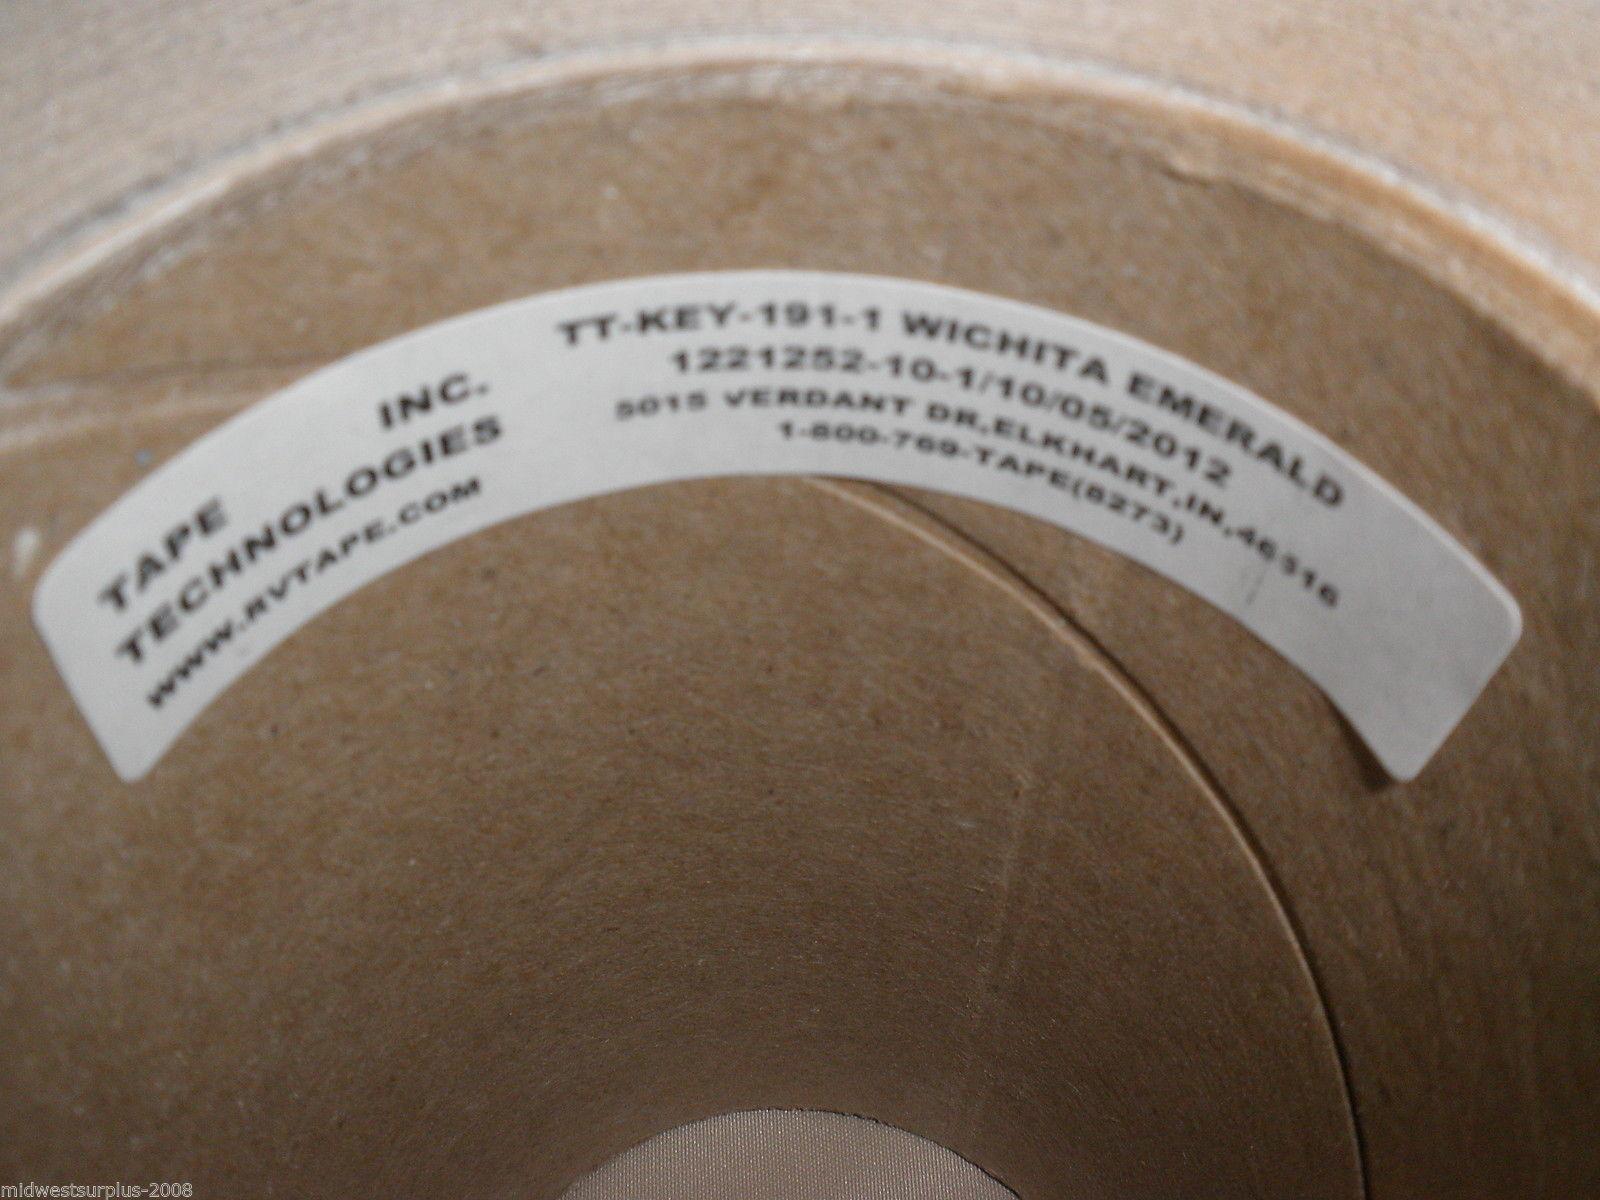 "Tape Technologies Keystone Witchita Emerald 6"" X 150' Wallpaper Border#12212521"